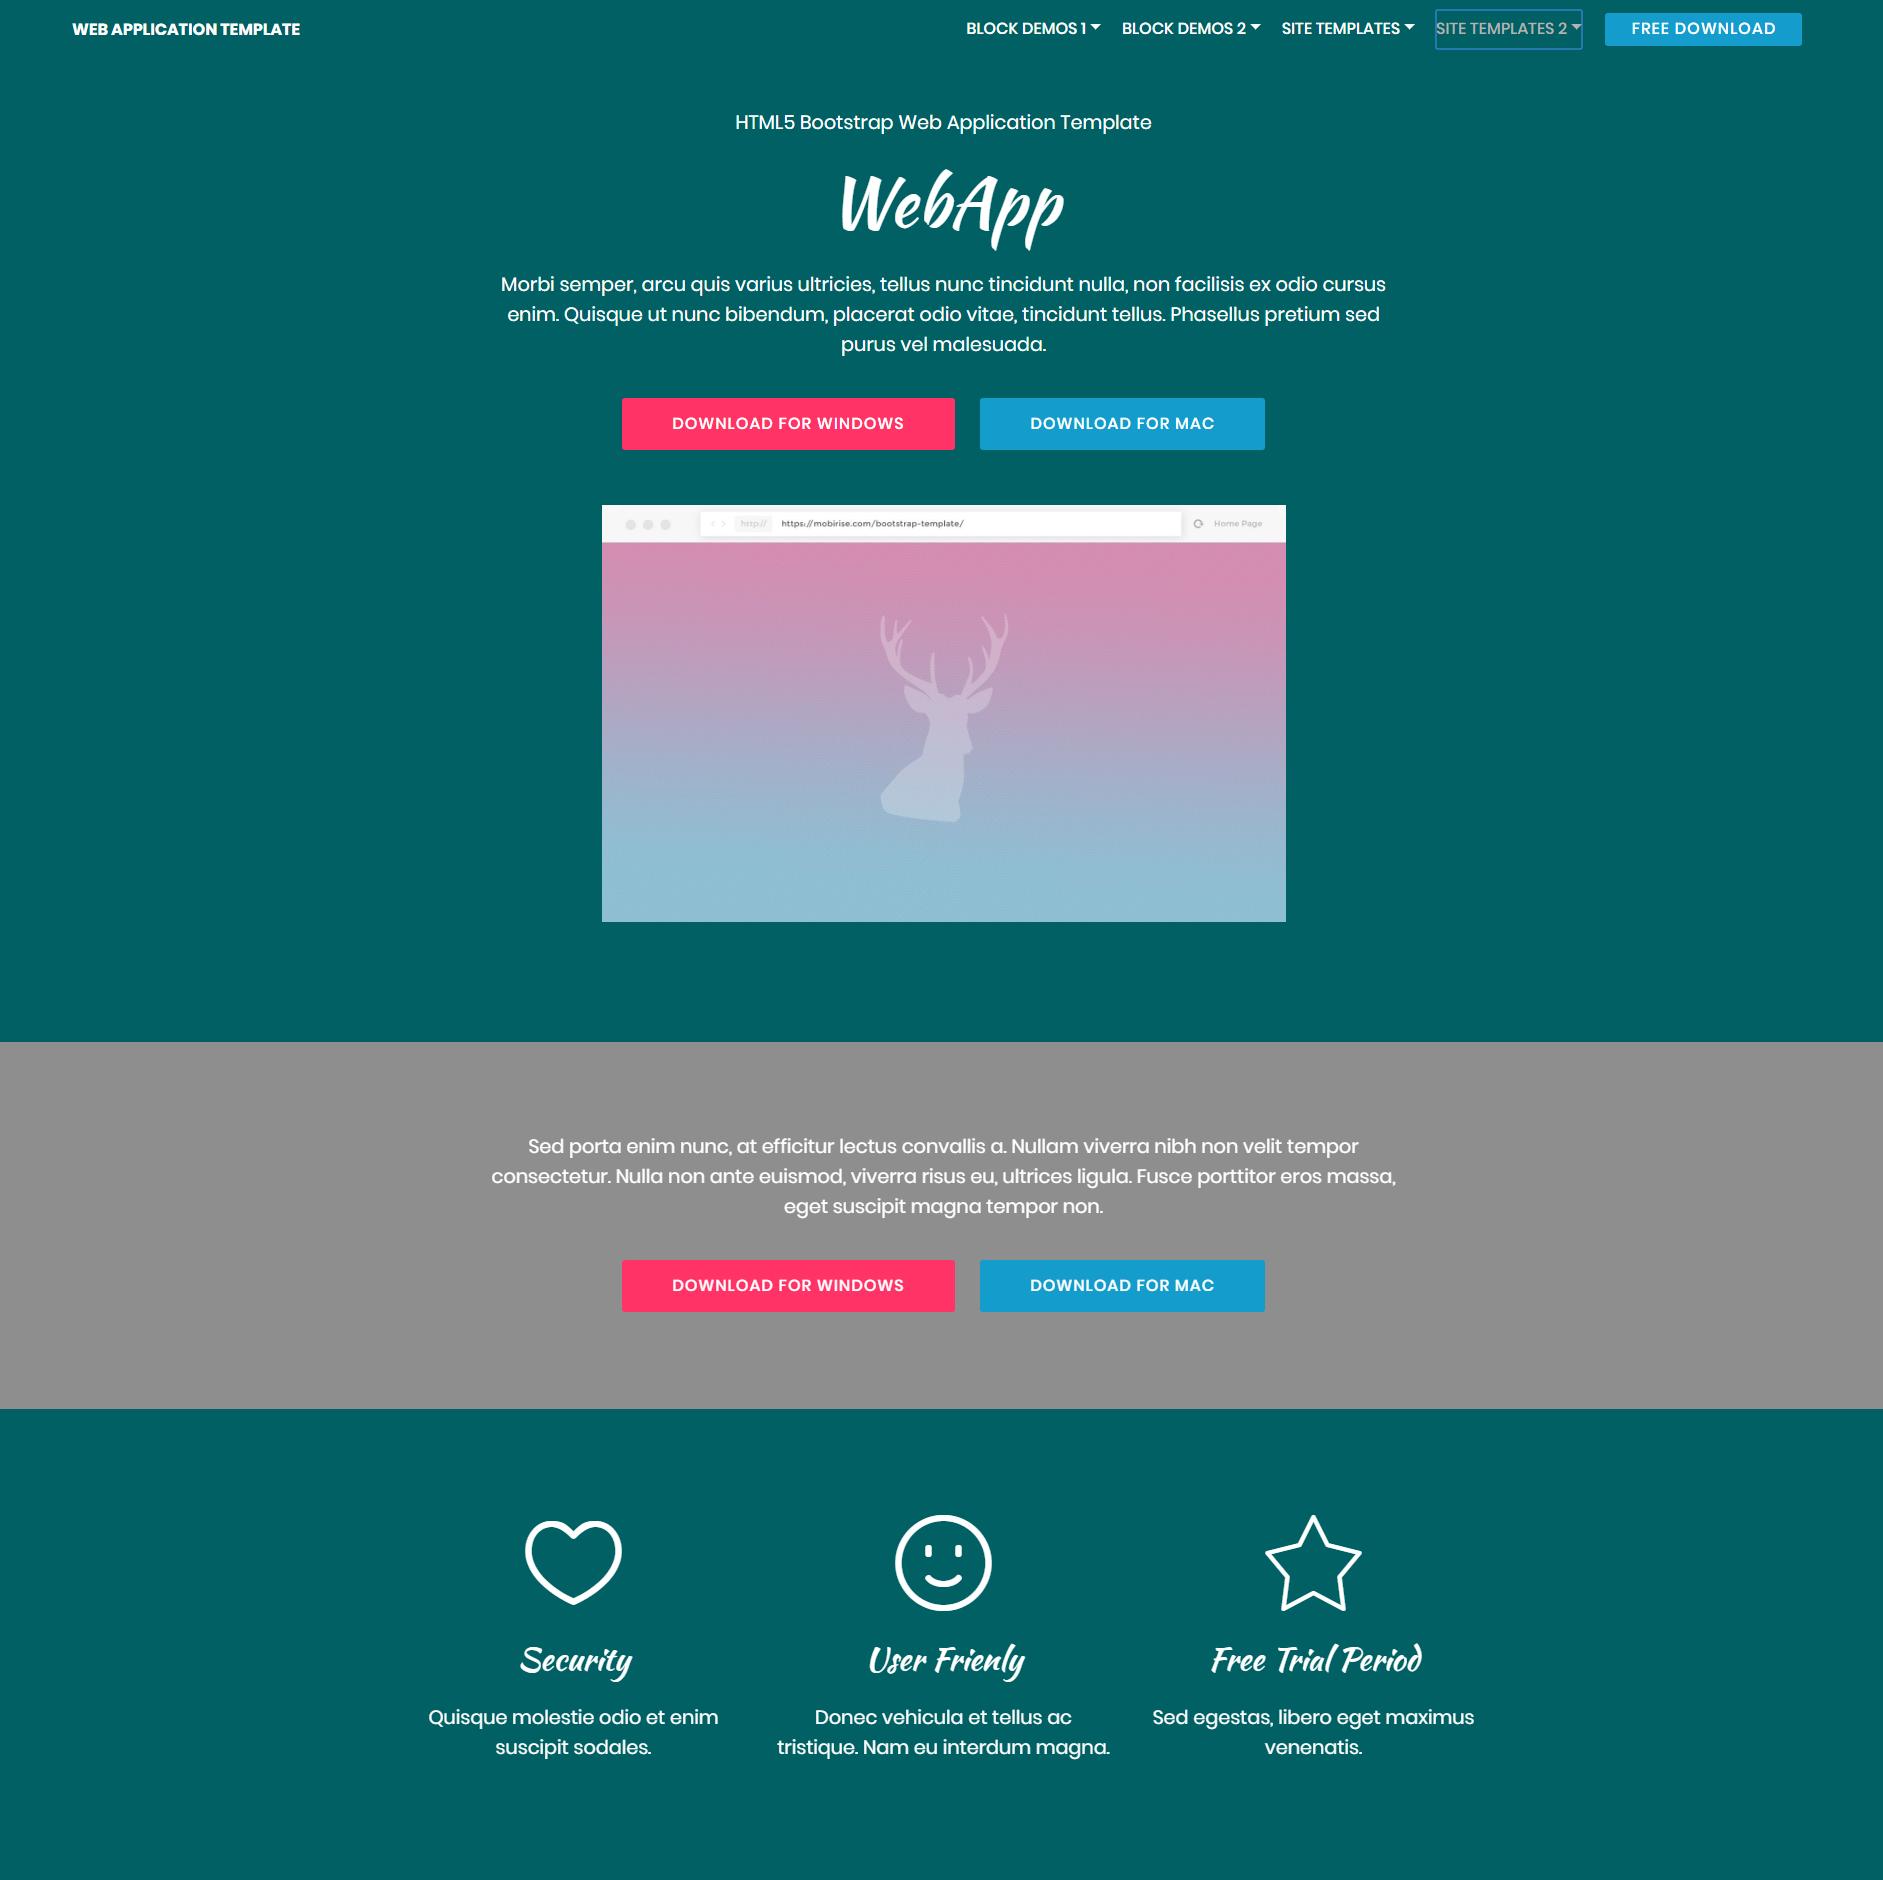 HTML Bootstrap Web Application Templates